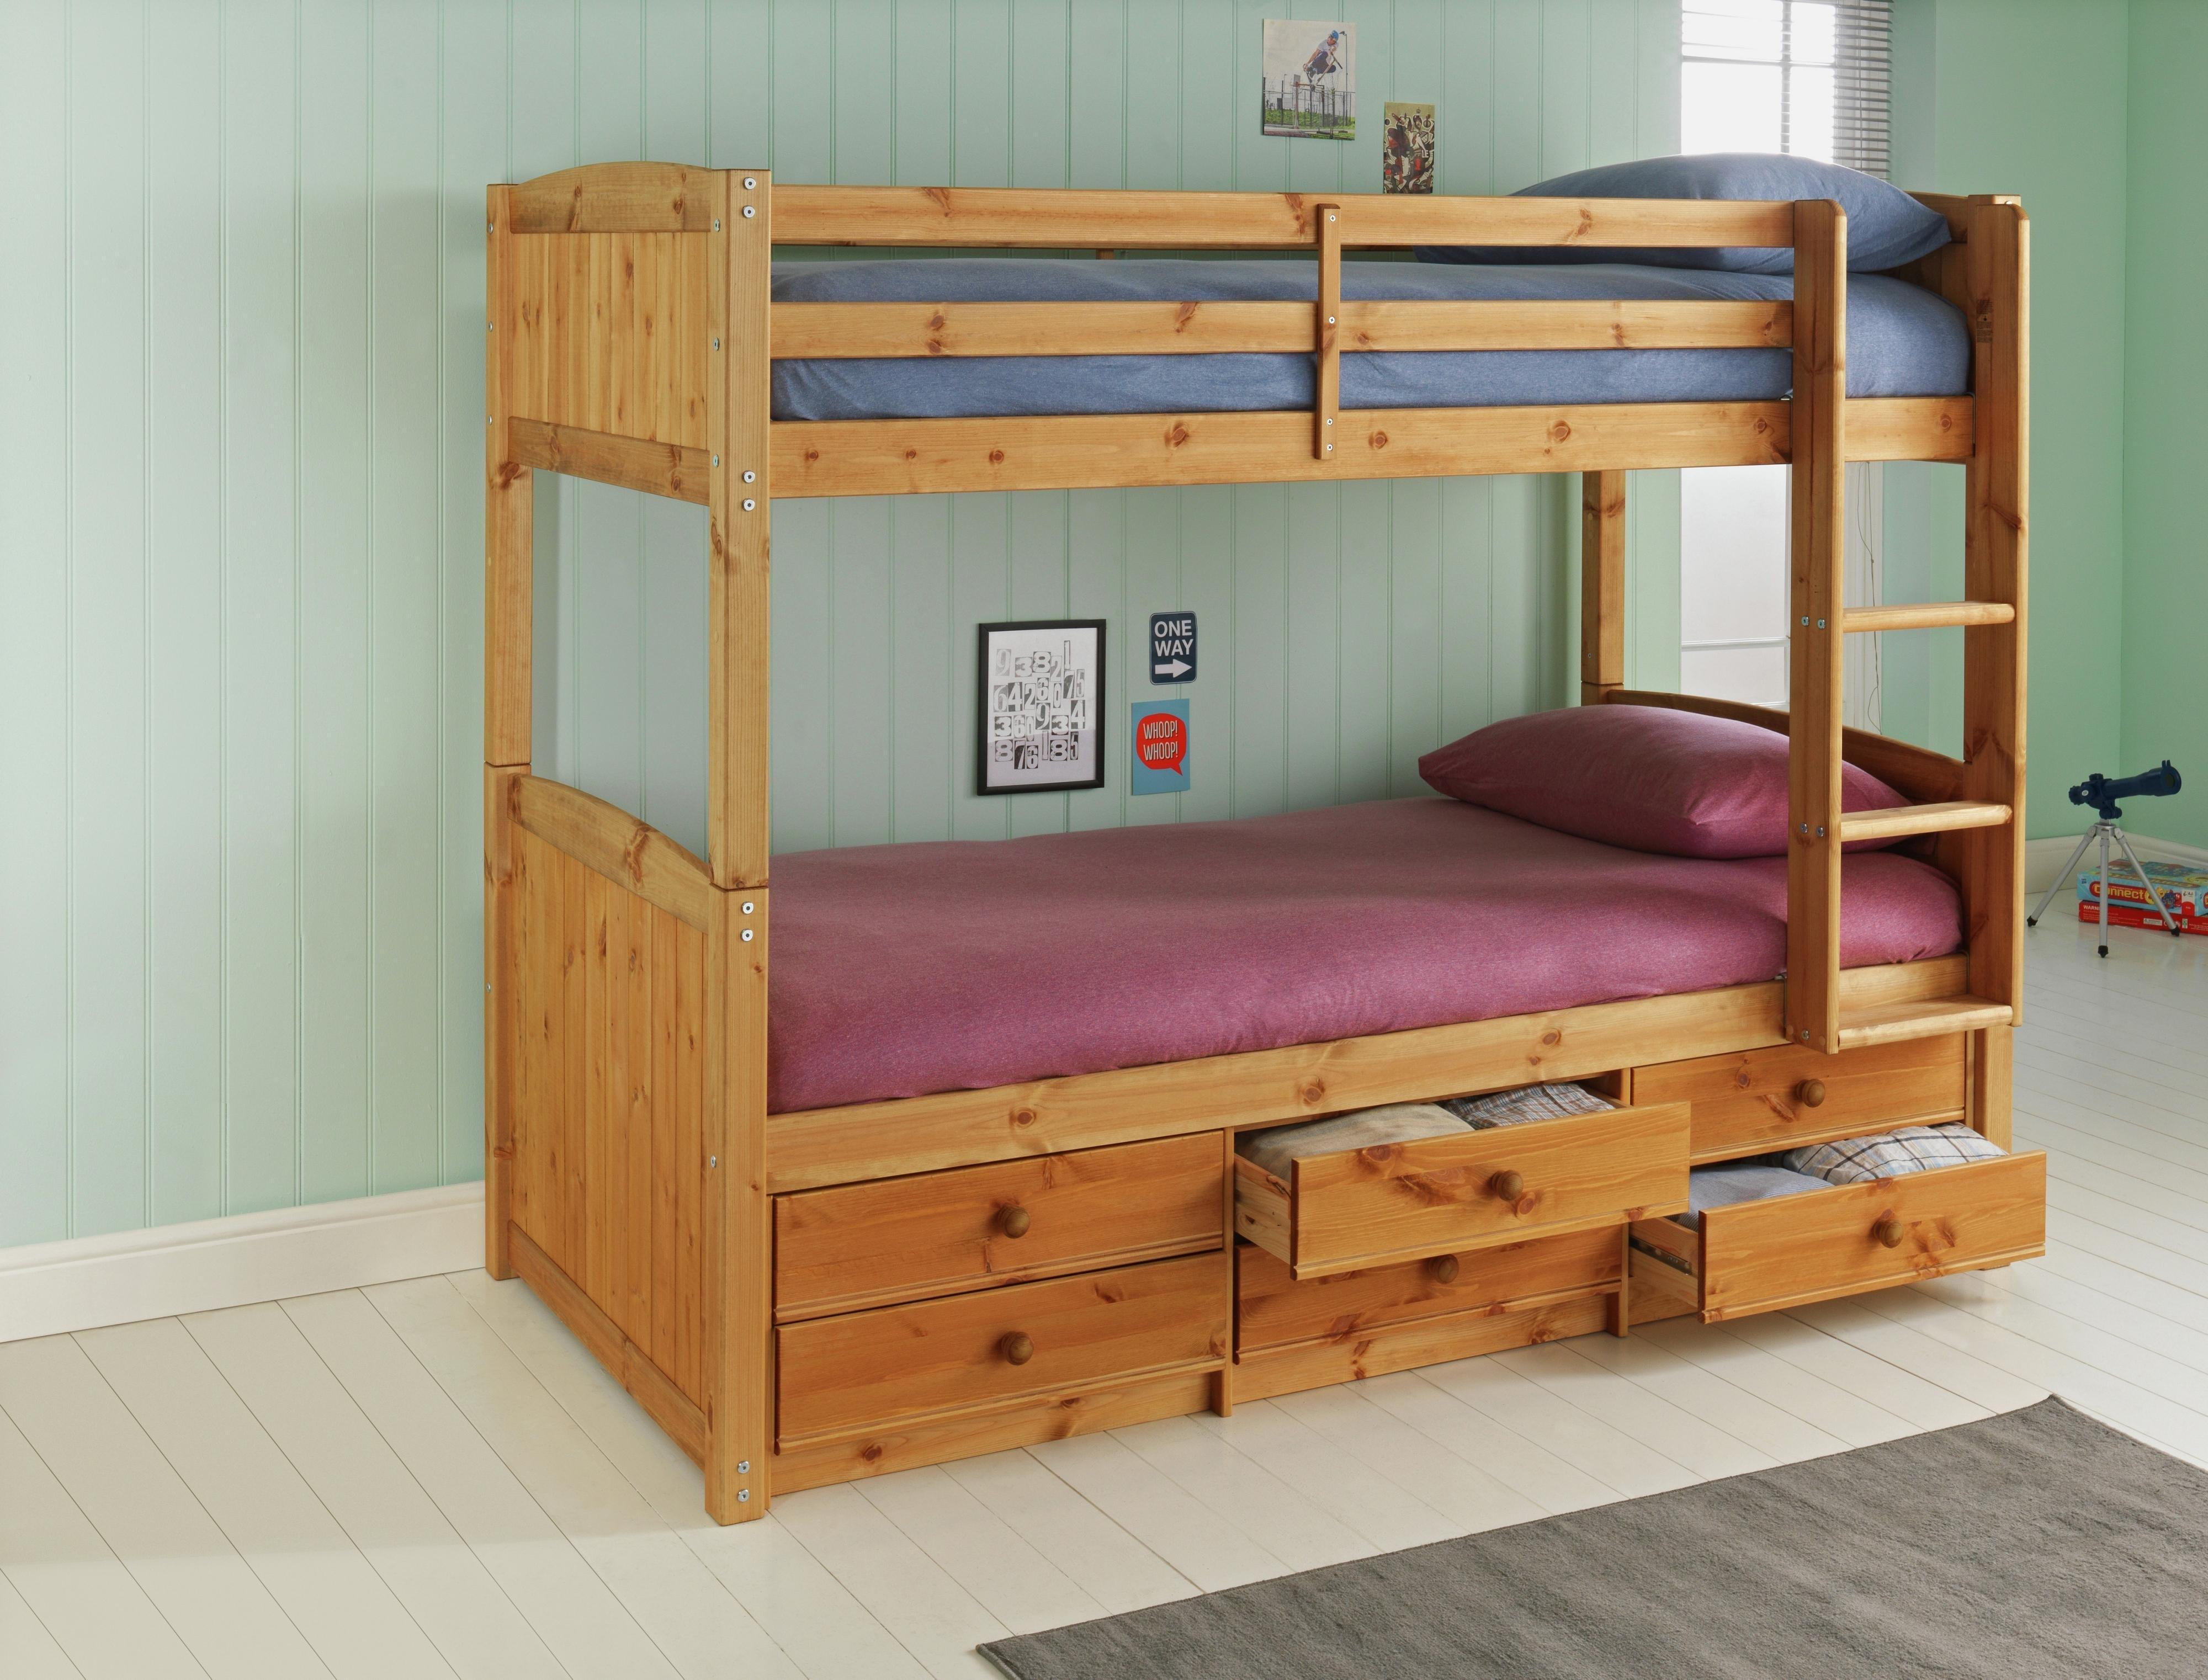 Image of Argos Home - Leigh Detachable - Single Bunk Bed Frame - Pine